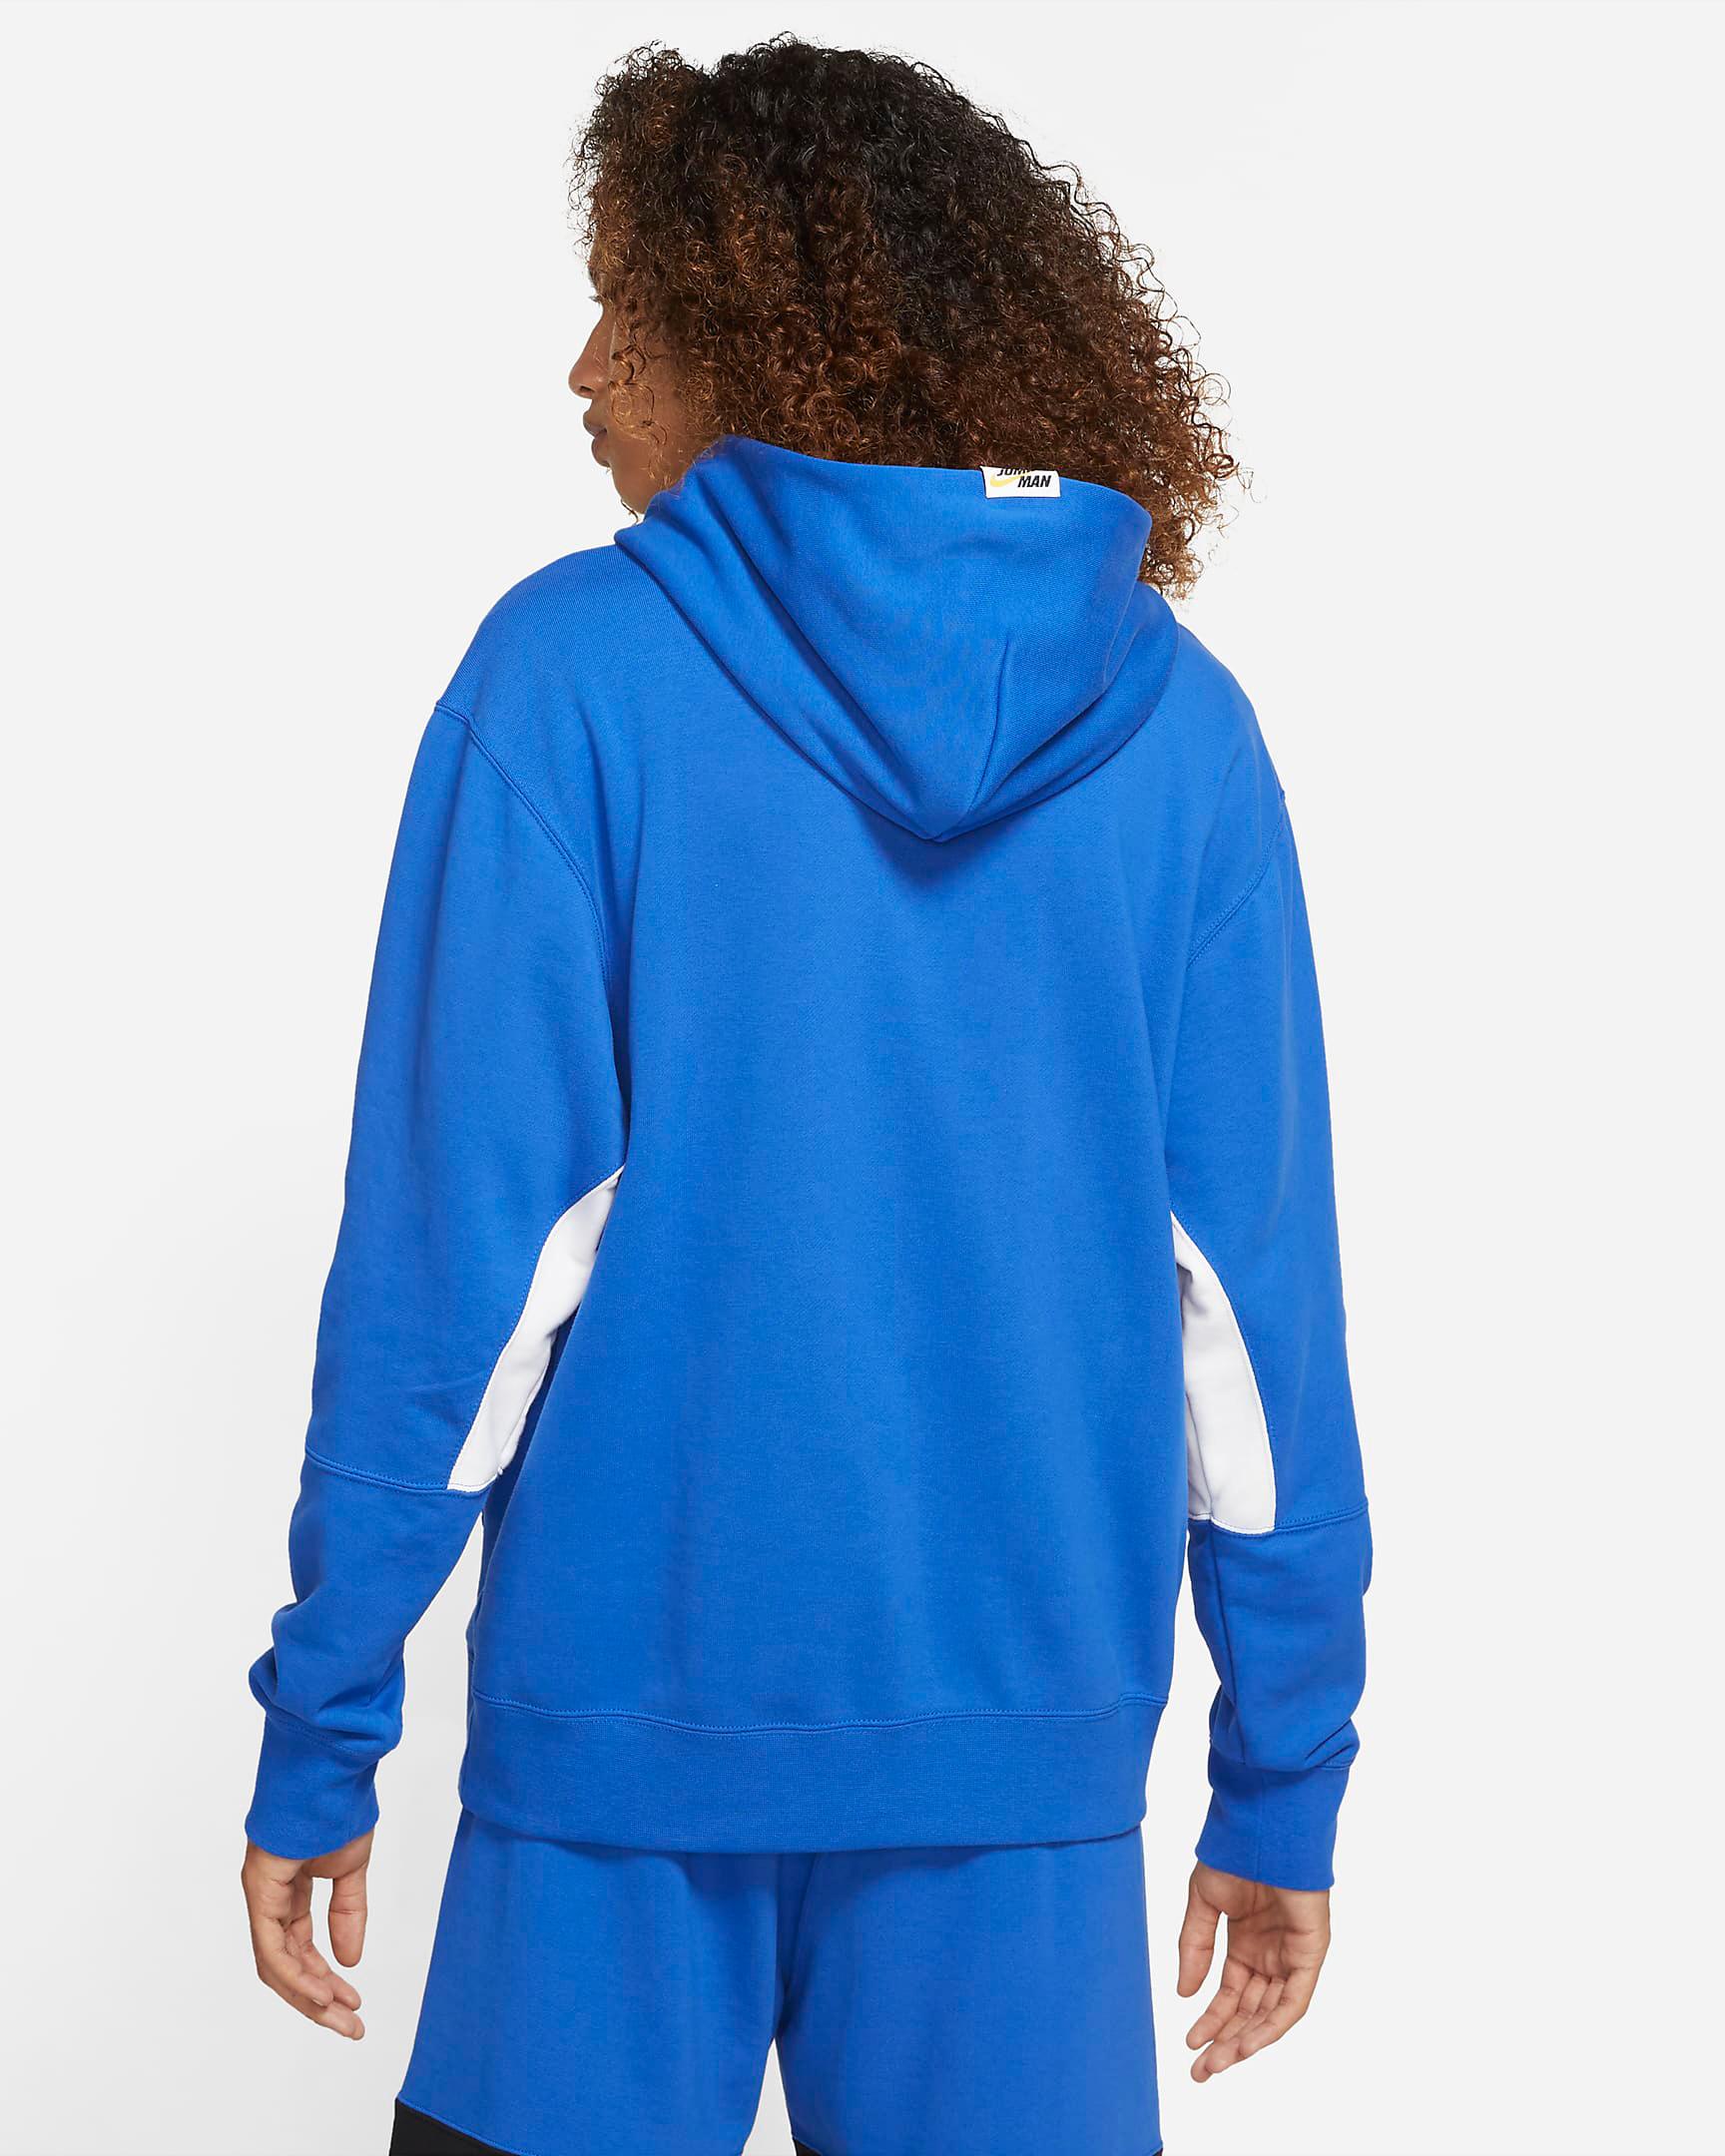 jordan-game-royal-jumpman-hoodie-2